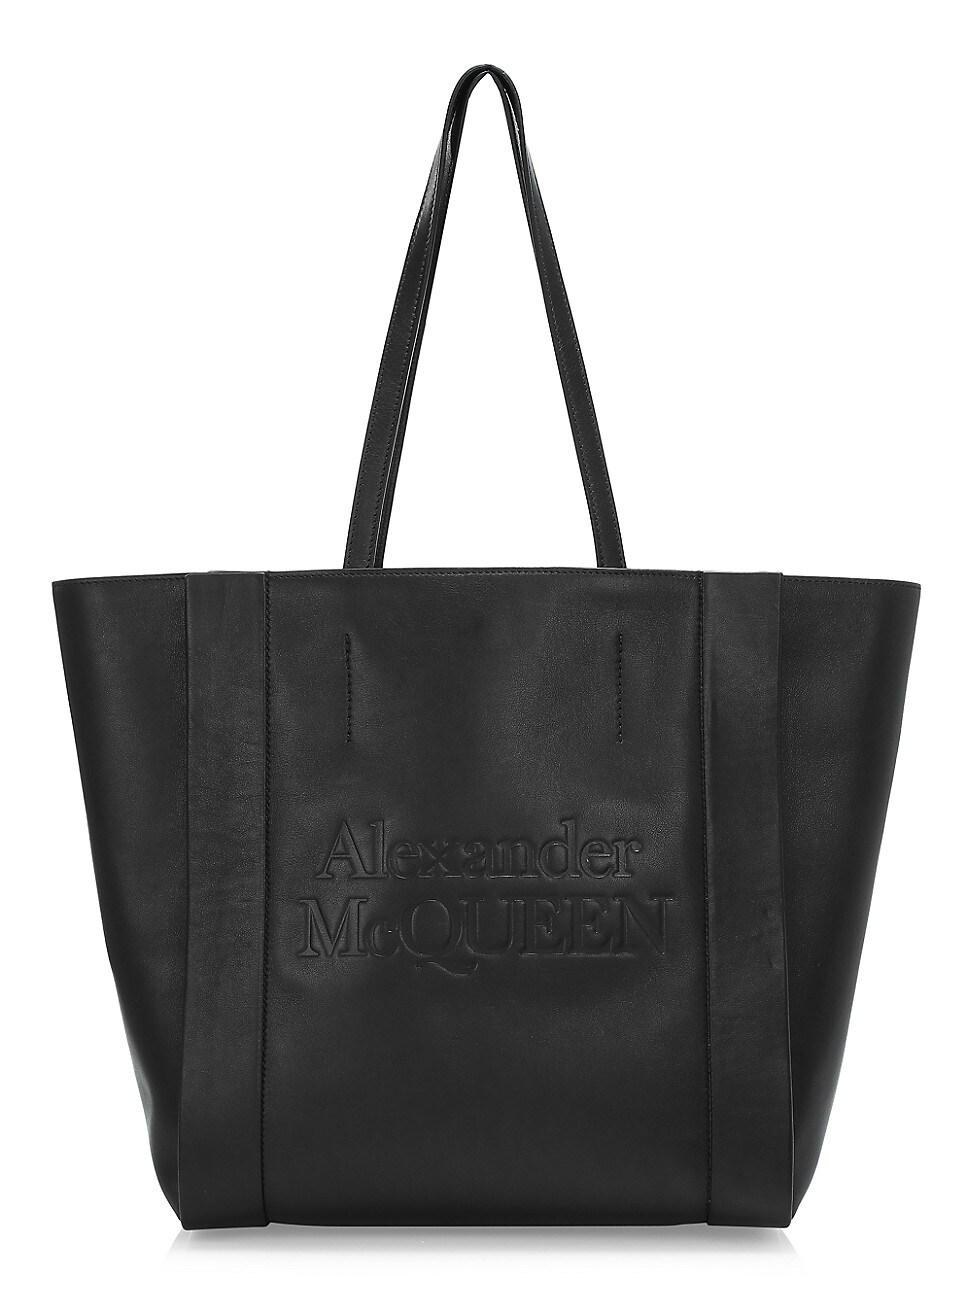 Alexander Mcqueen Women's Signature Shopper Leather Bag In Black